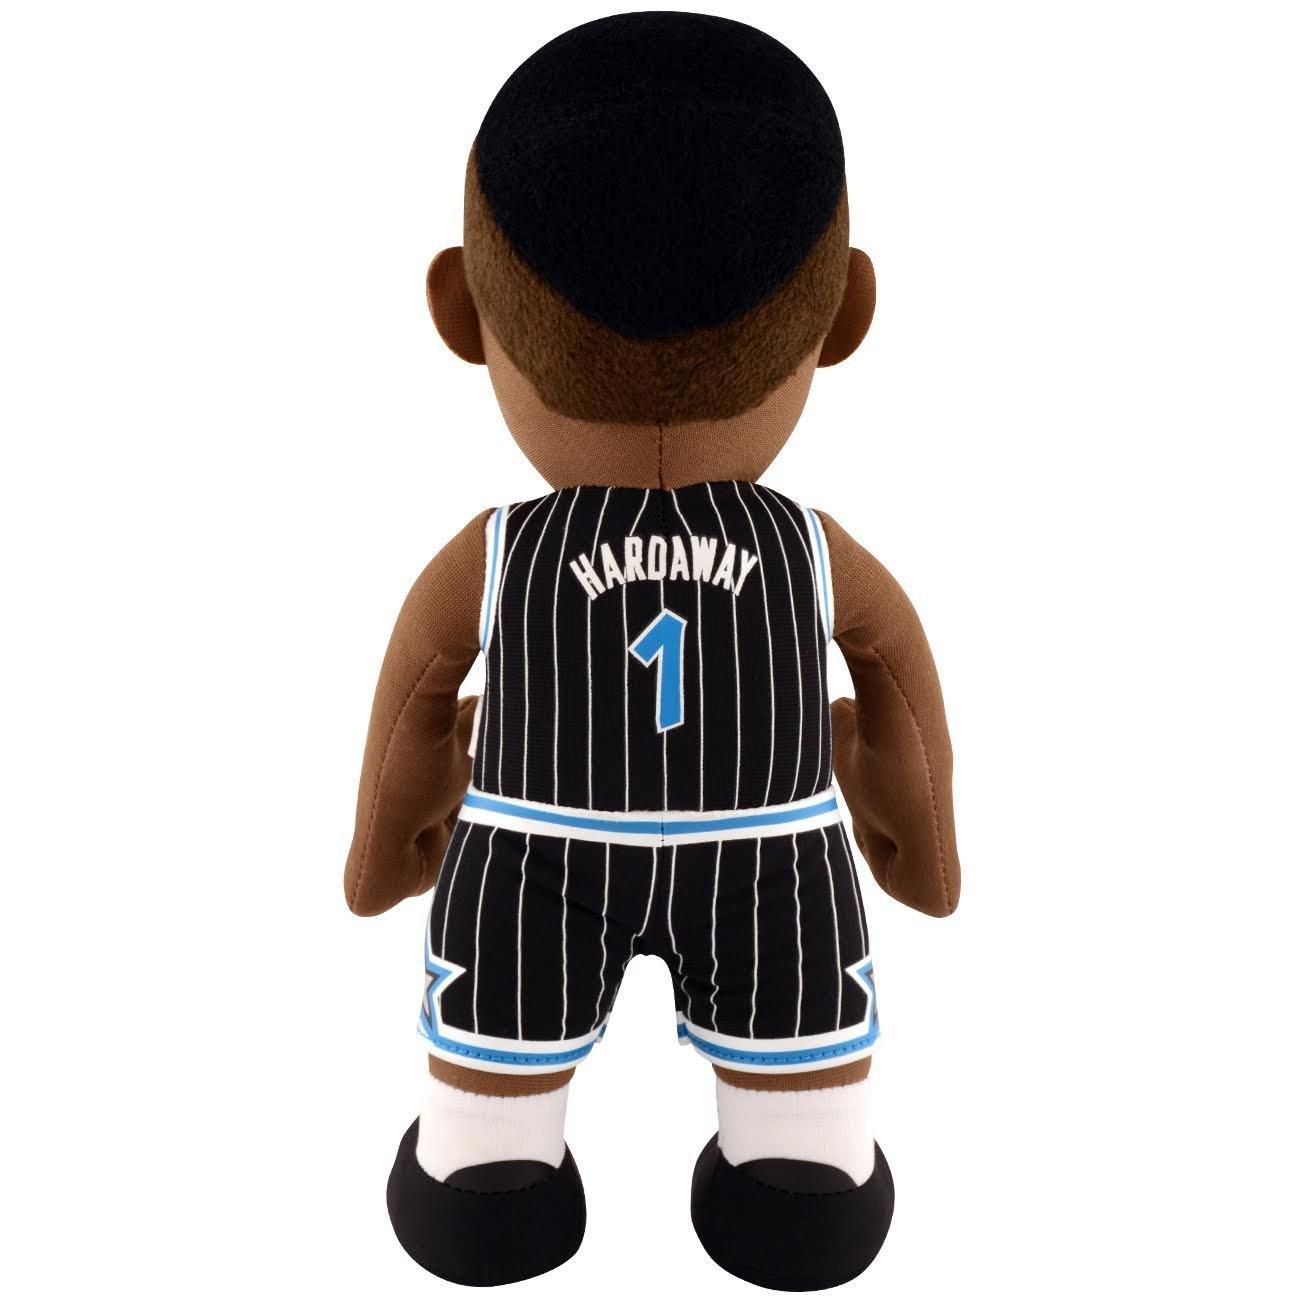 https://www.jacksjersey.com/wp-content/uploads/2020/01/cheapest-nba-jerseys-online-Bleacher-Creature-Penny-Hardaway-Orlando-Magic-Hardwood-Classics-Throwback-NBA-10-Bleacher-Creature-discount-jerseys-china-1.jpg